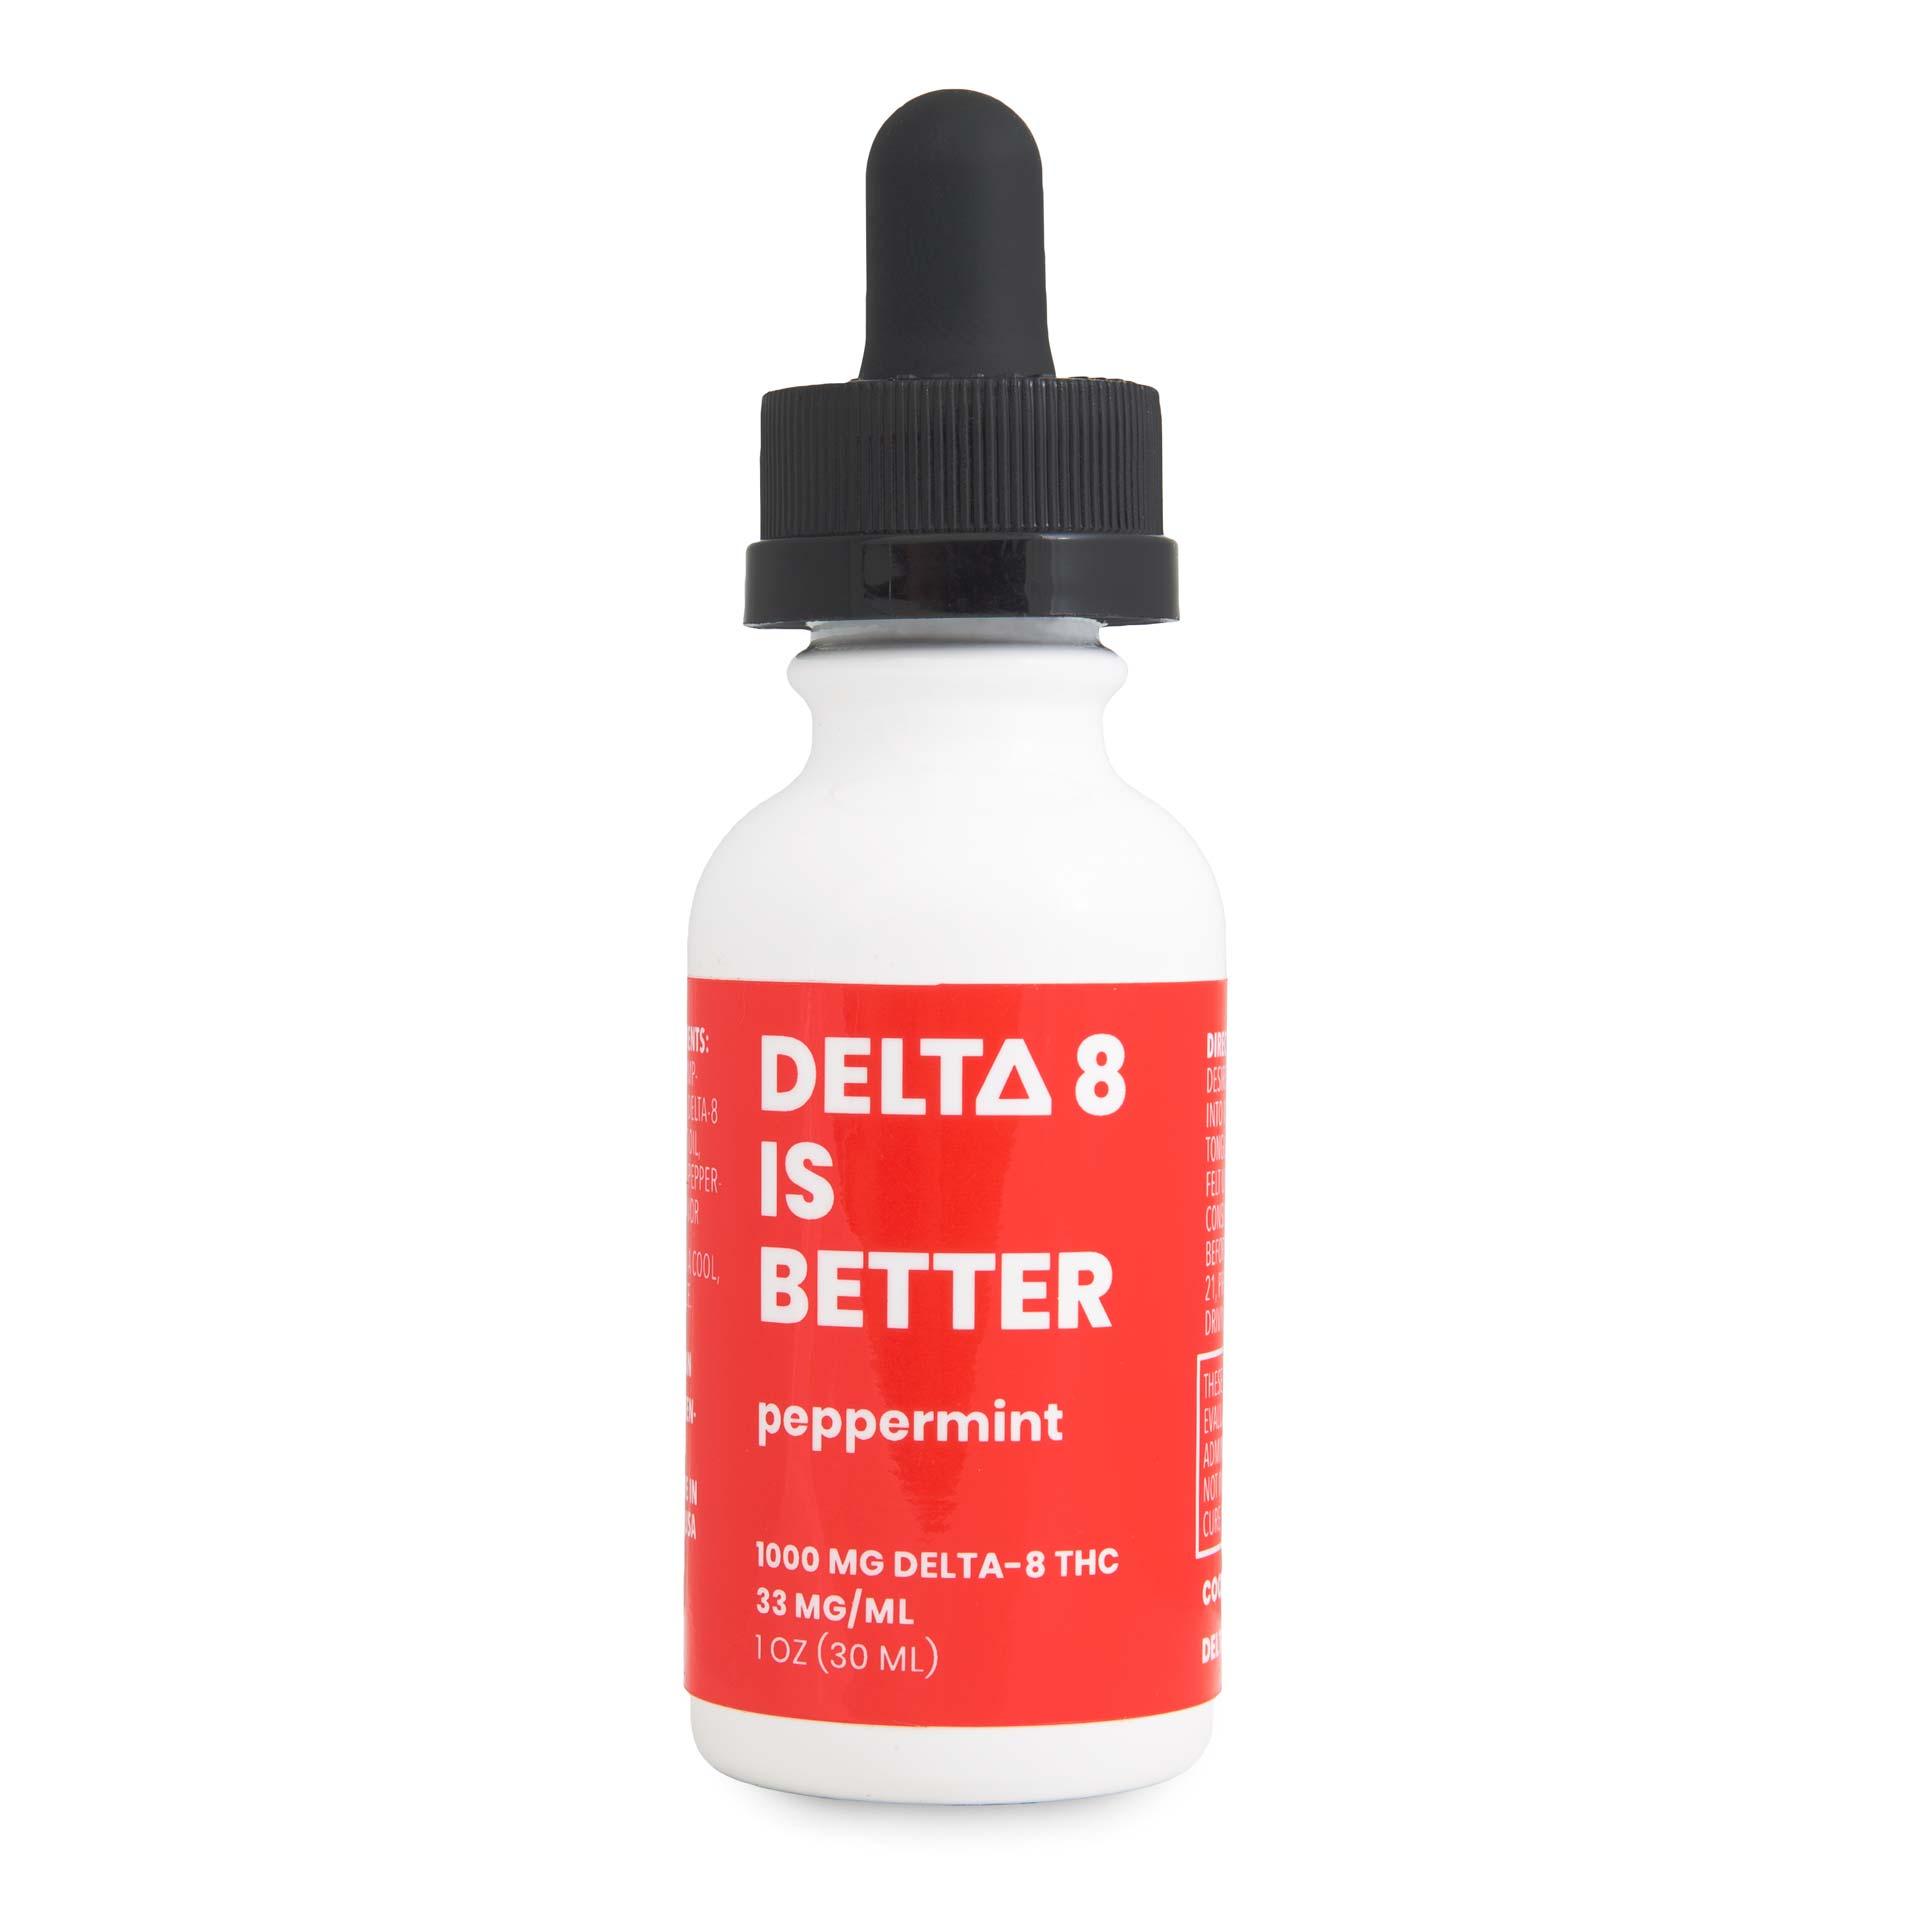 DELTA 8 BETTER 1 OZ TINCTURE 1000MG - PEPPERMINT